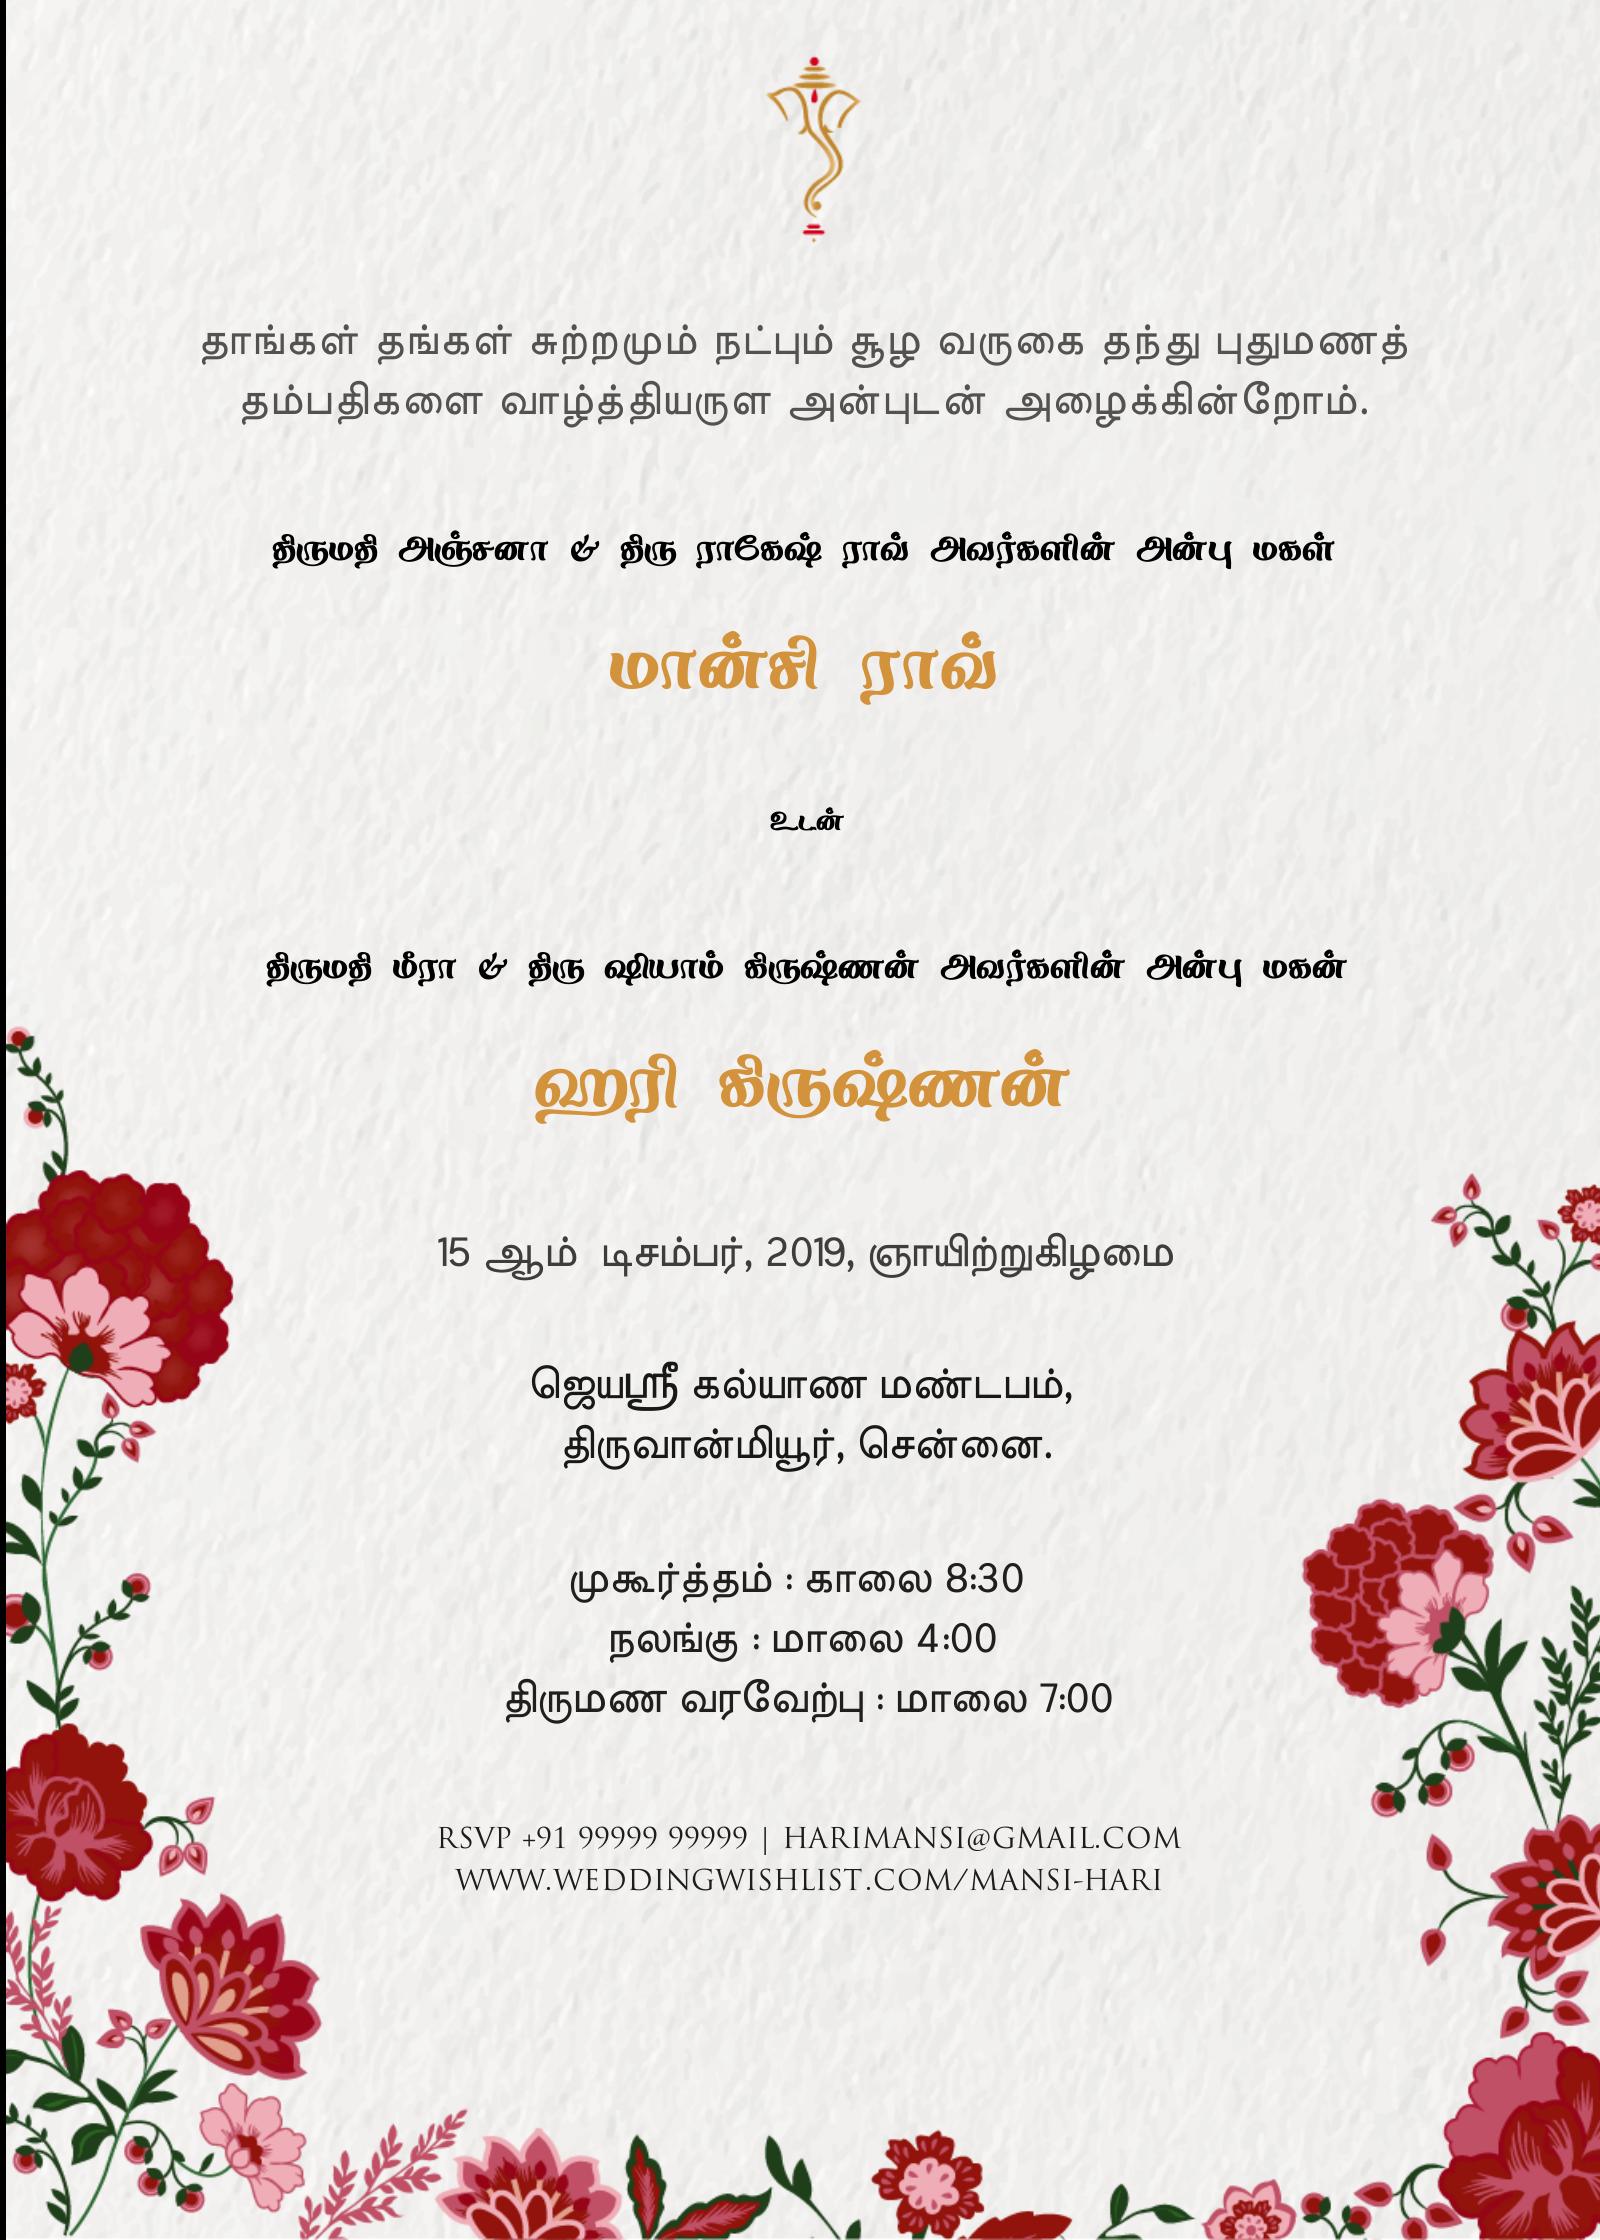 Indian Blossom In 2020 Wedding Invitations Wedding Invitations Online Invitation Card Maker